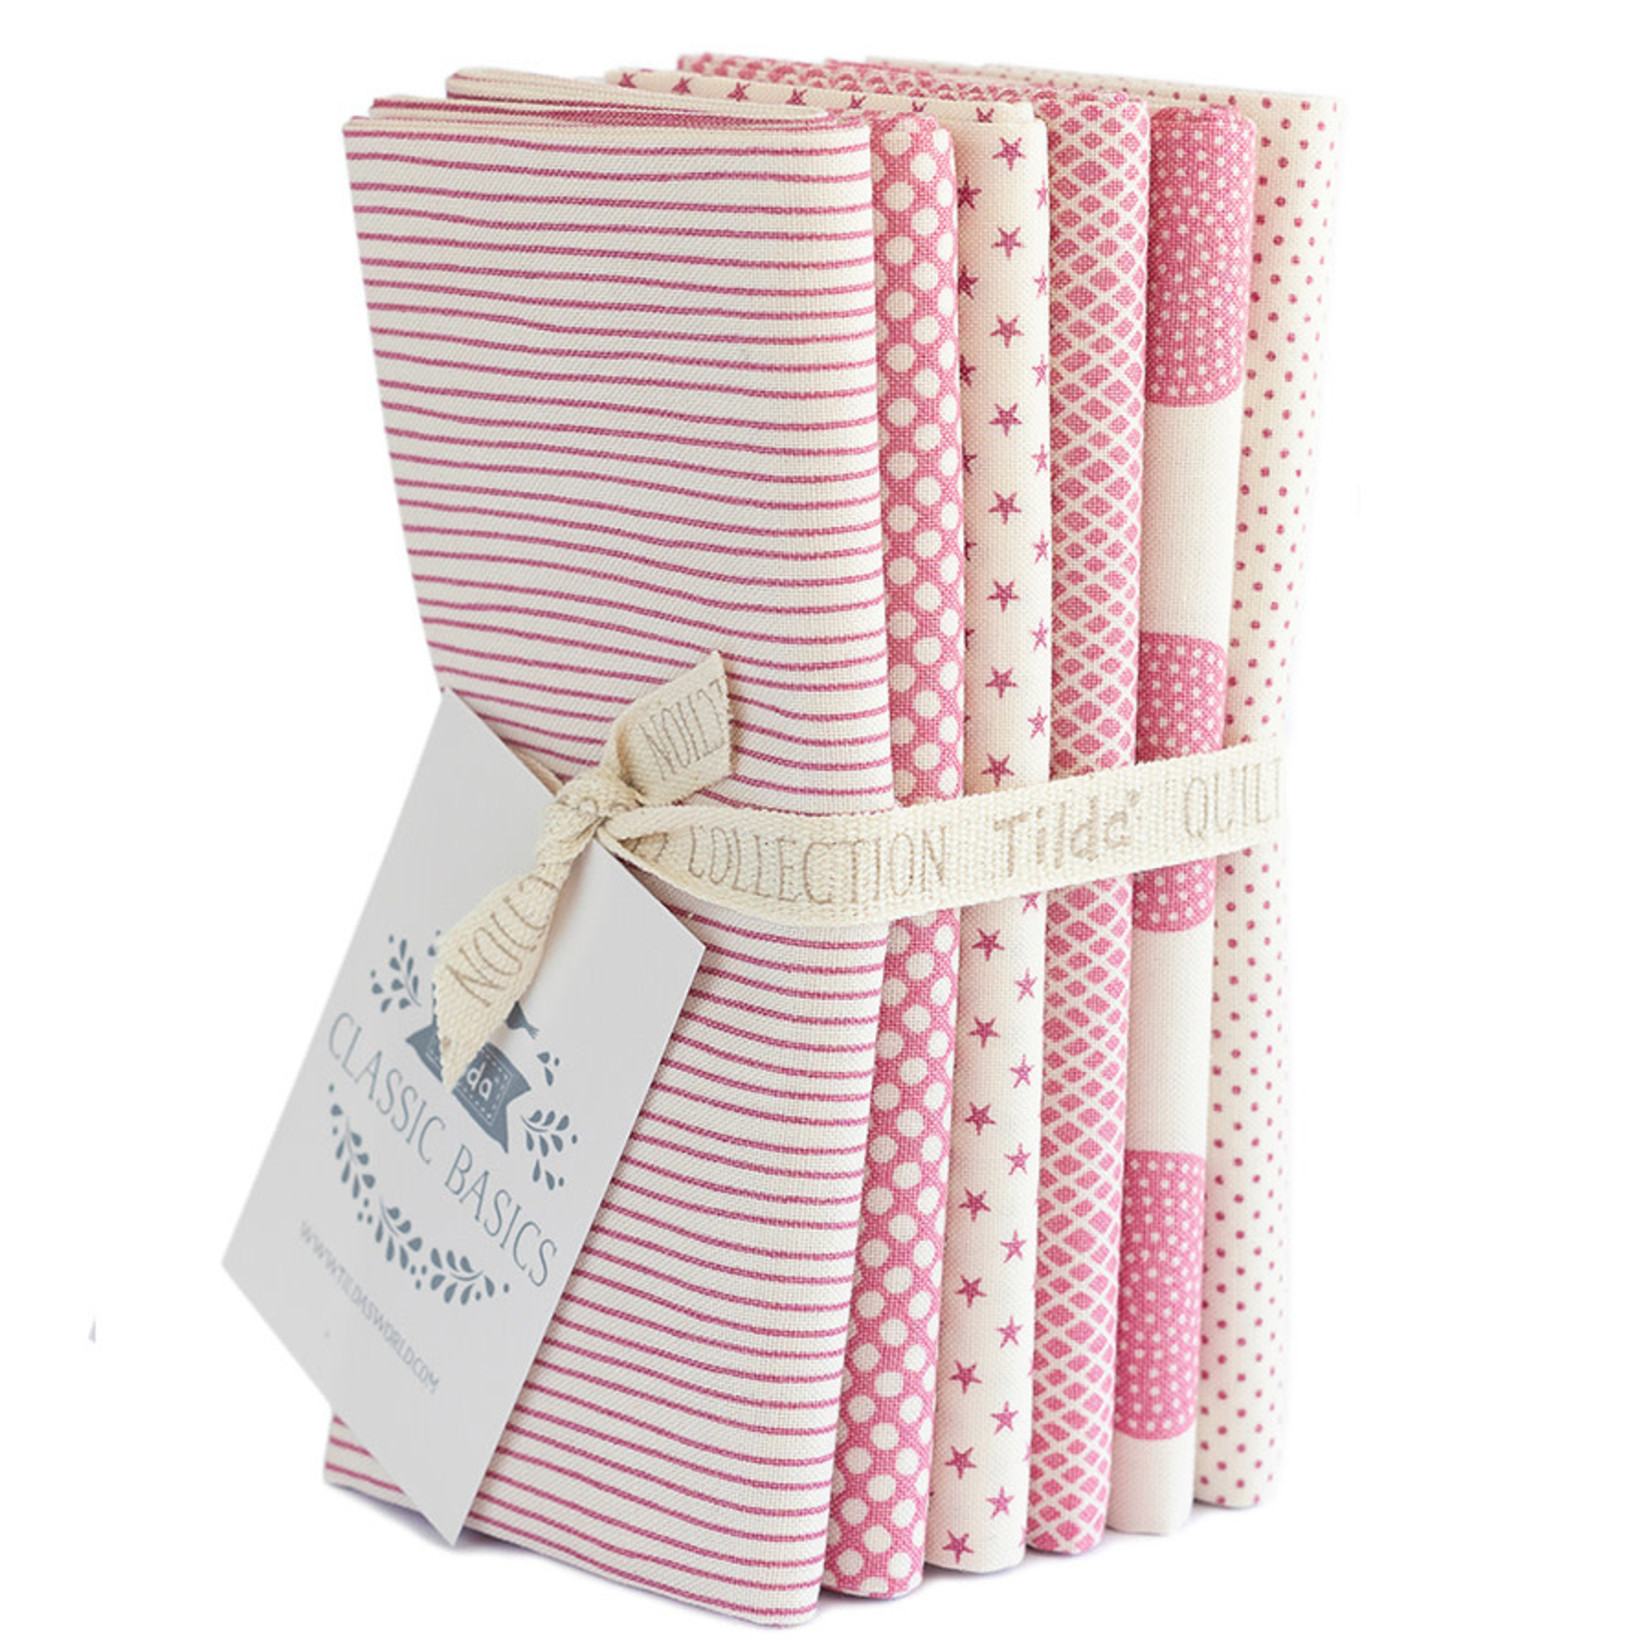 Tilda Tilda Basic, Fat Quarter  Bundle Classic Pink 6 pcs 300034